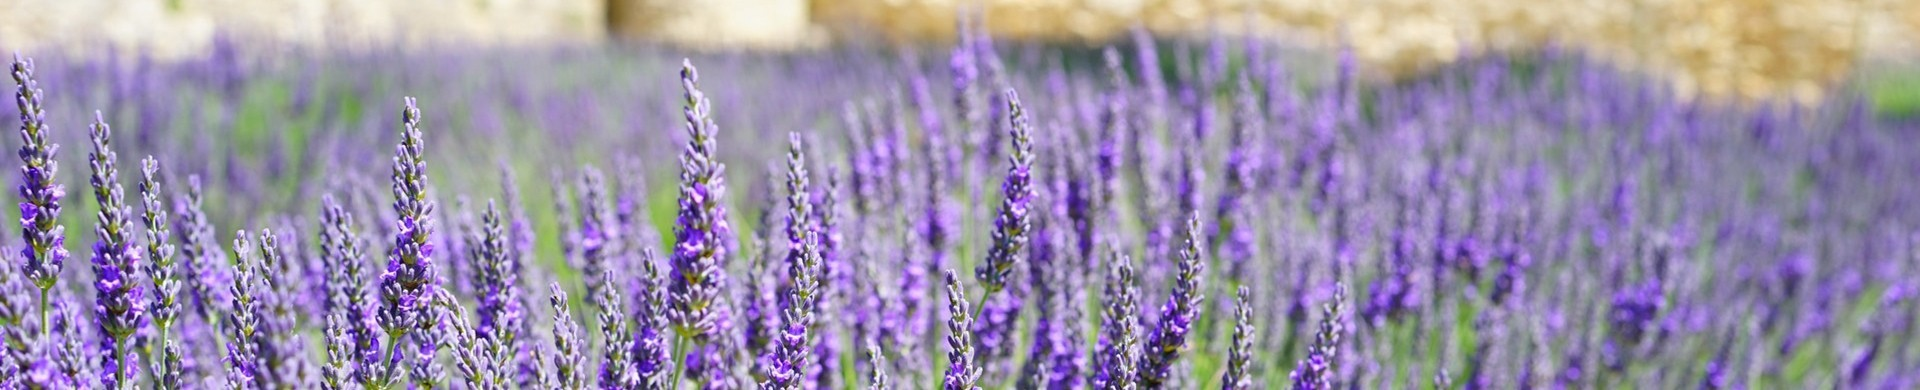 Comprar plantas aromaticas - Venta de plantas aromaticas